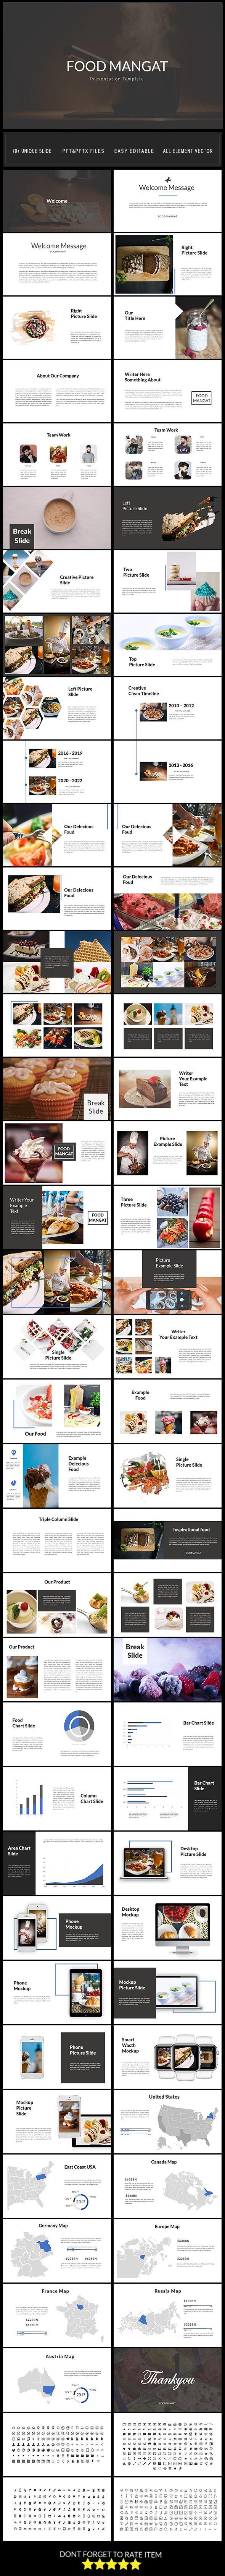 Food Mangat Powerpoint Presentation Template - PowerPoint Templates Presentation Templates